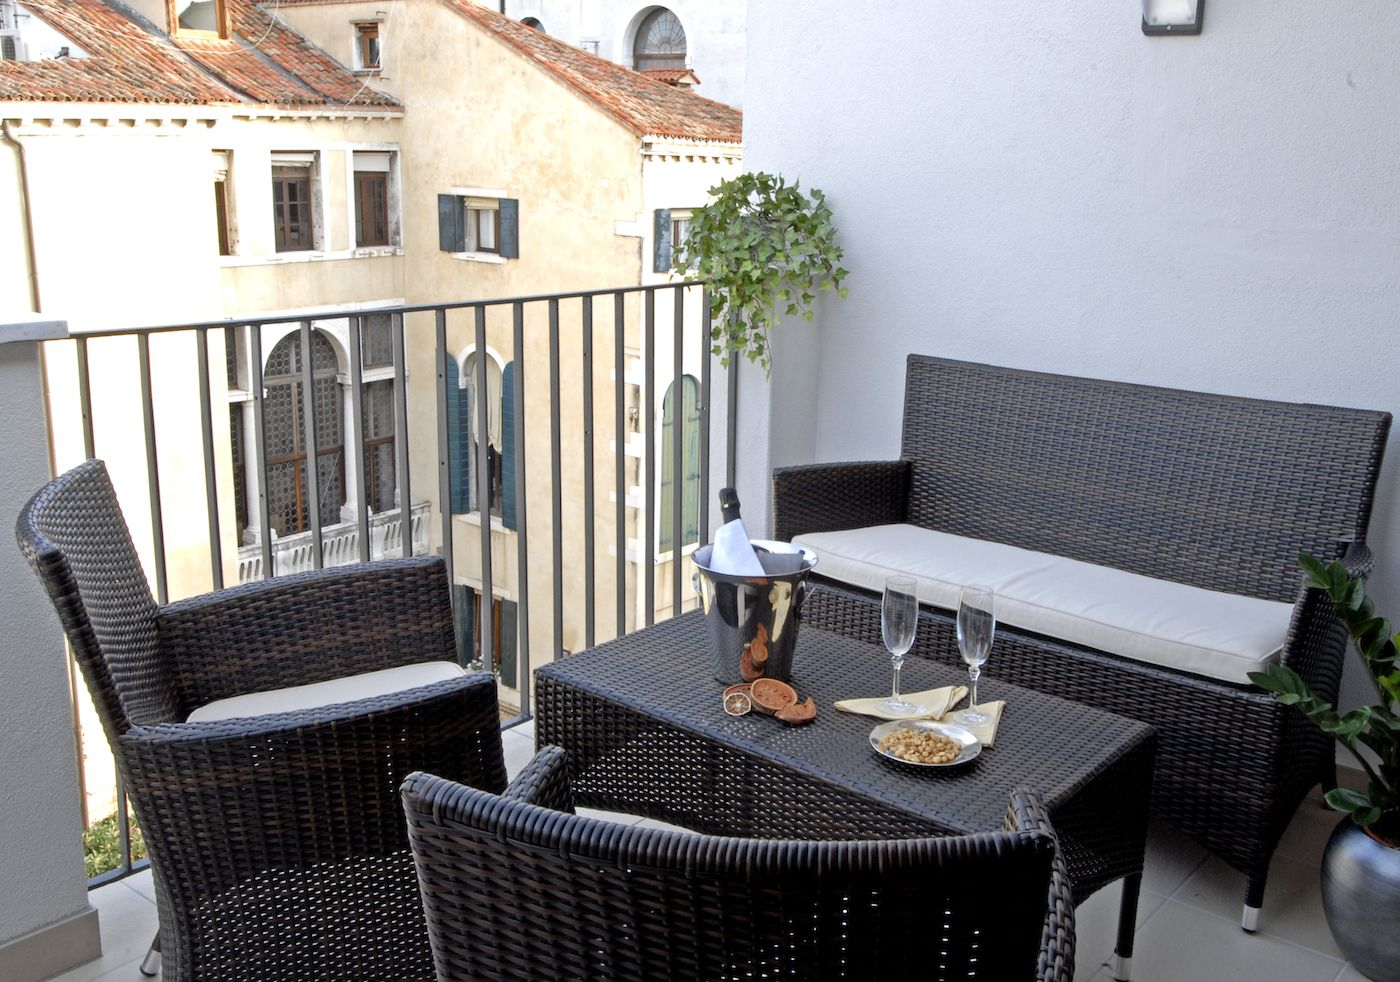 enjoy the aperitif on the terrace